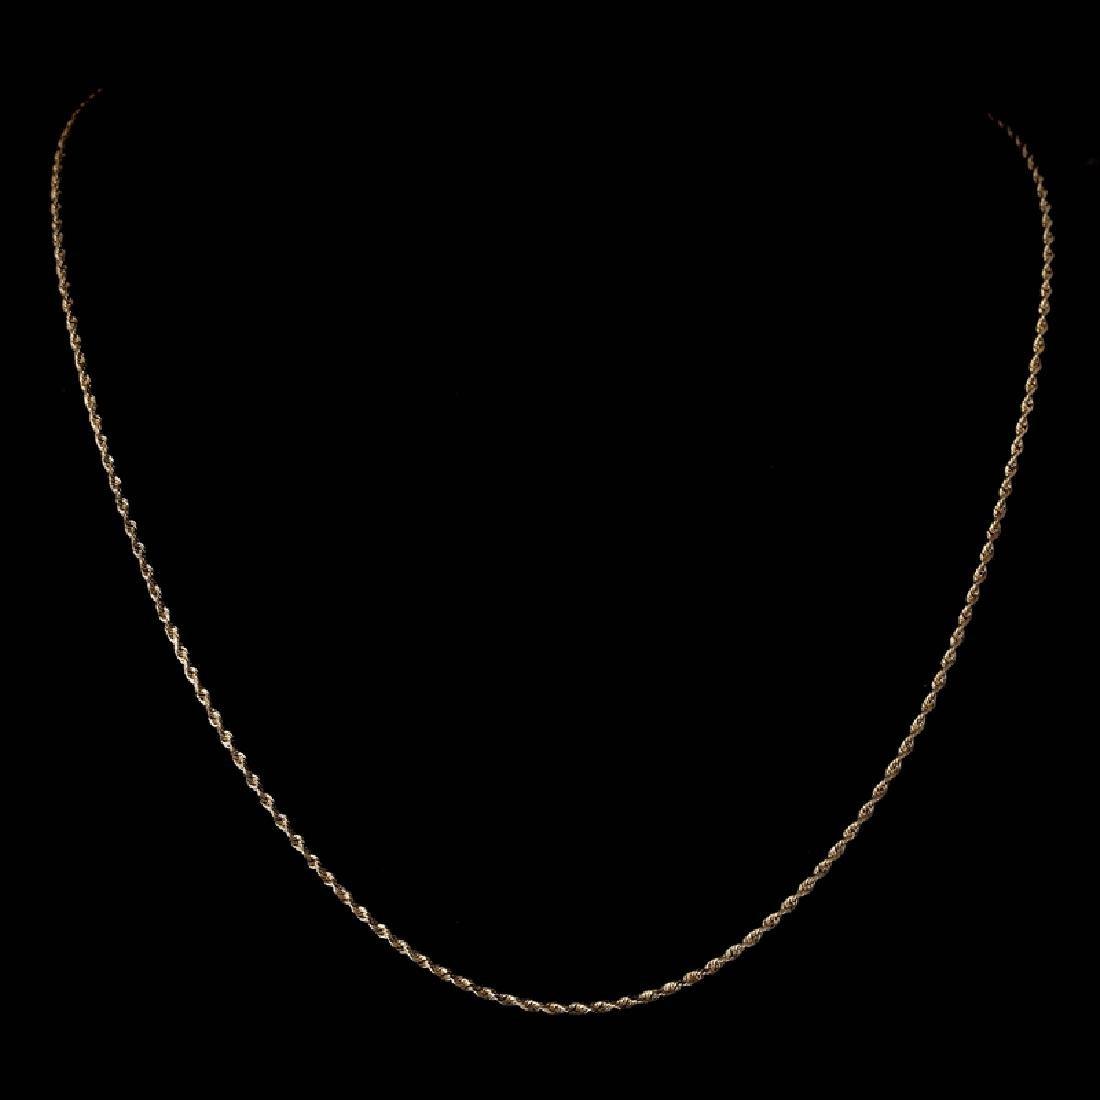 *Fine Jewelry 14 KT Gold, 3.7GR, 18'' Diamond Cut Rope